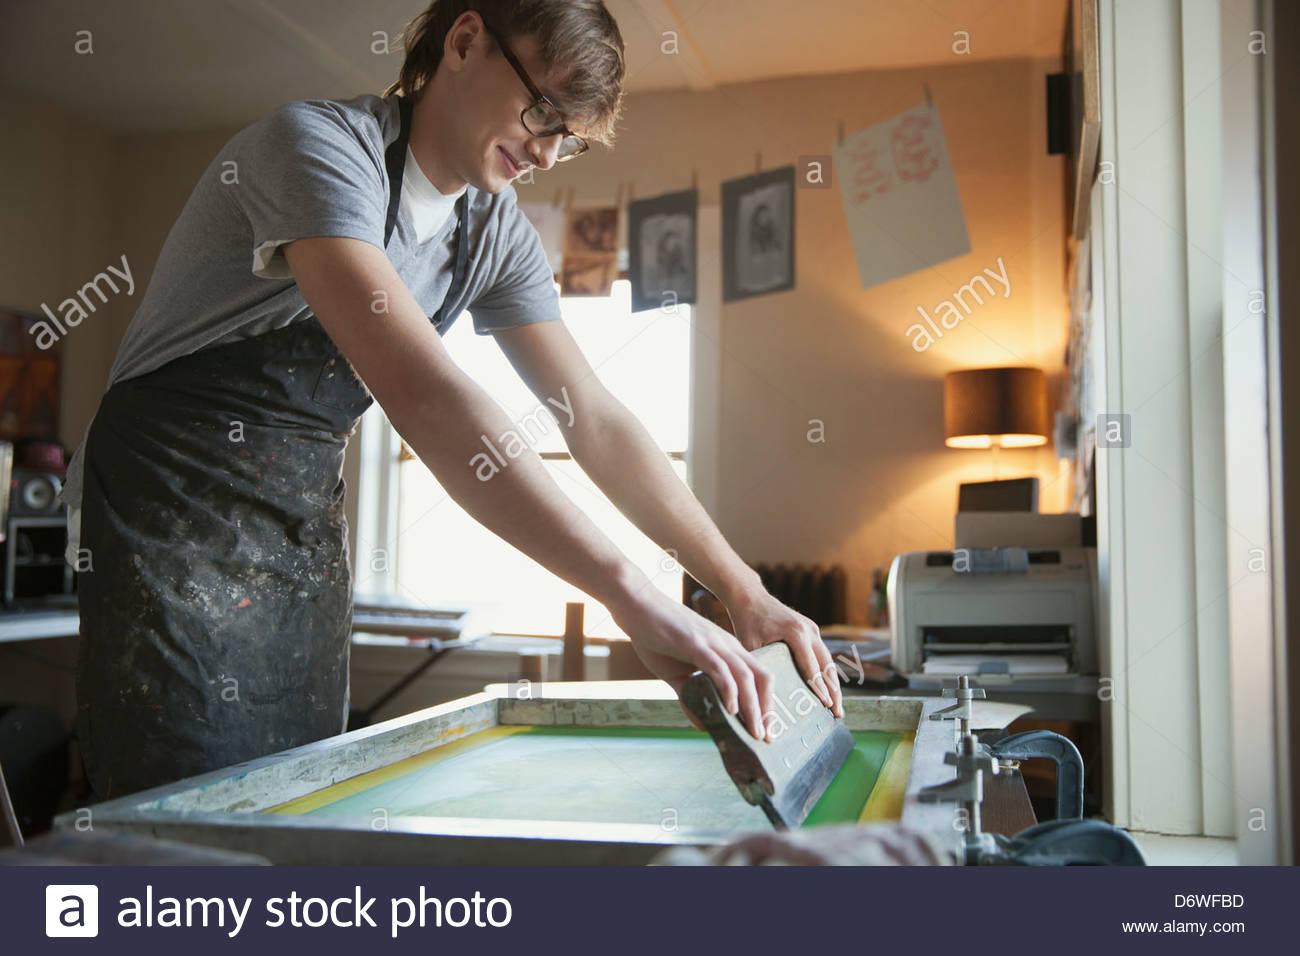 Male design professional working on silk screen - Stock Image